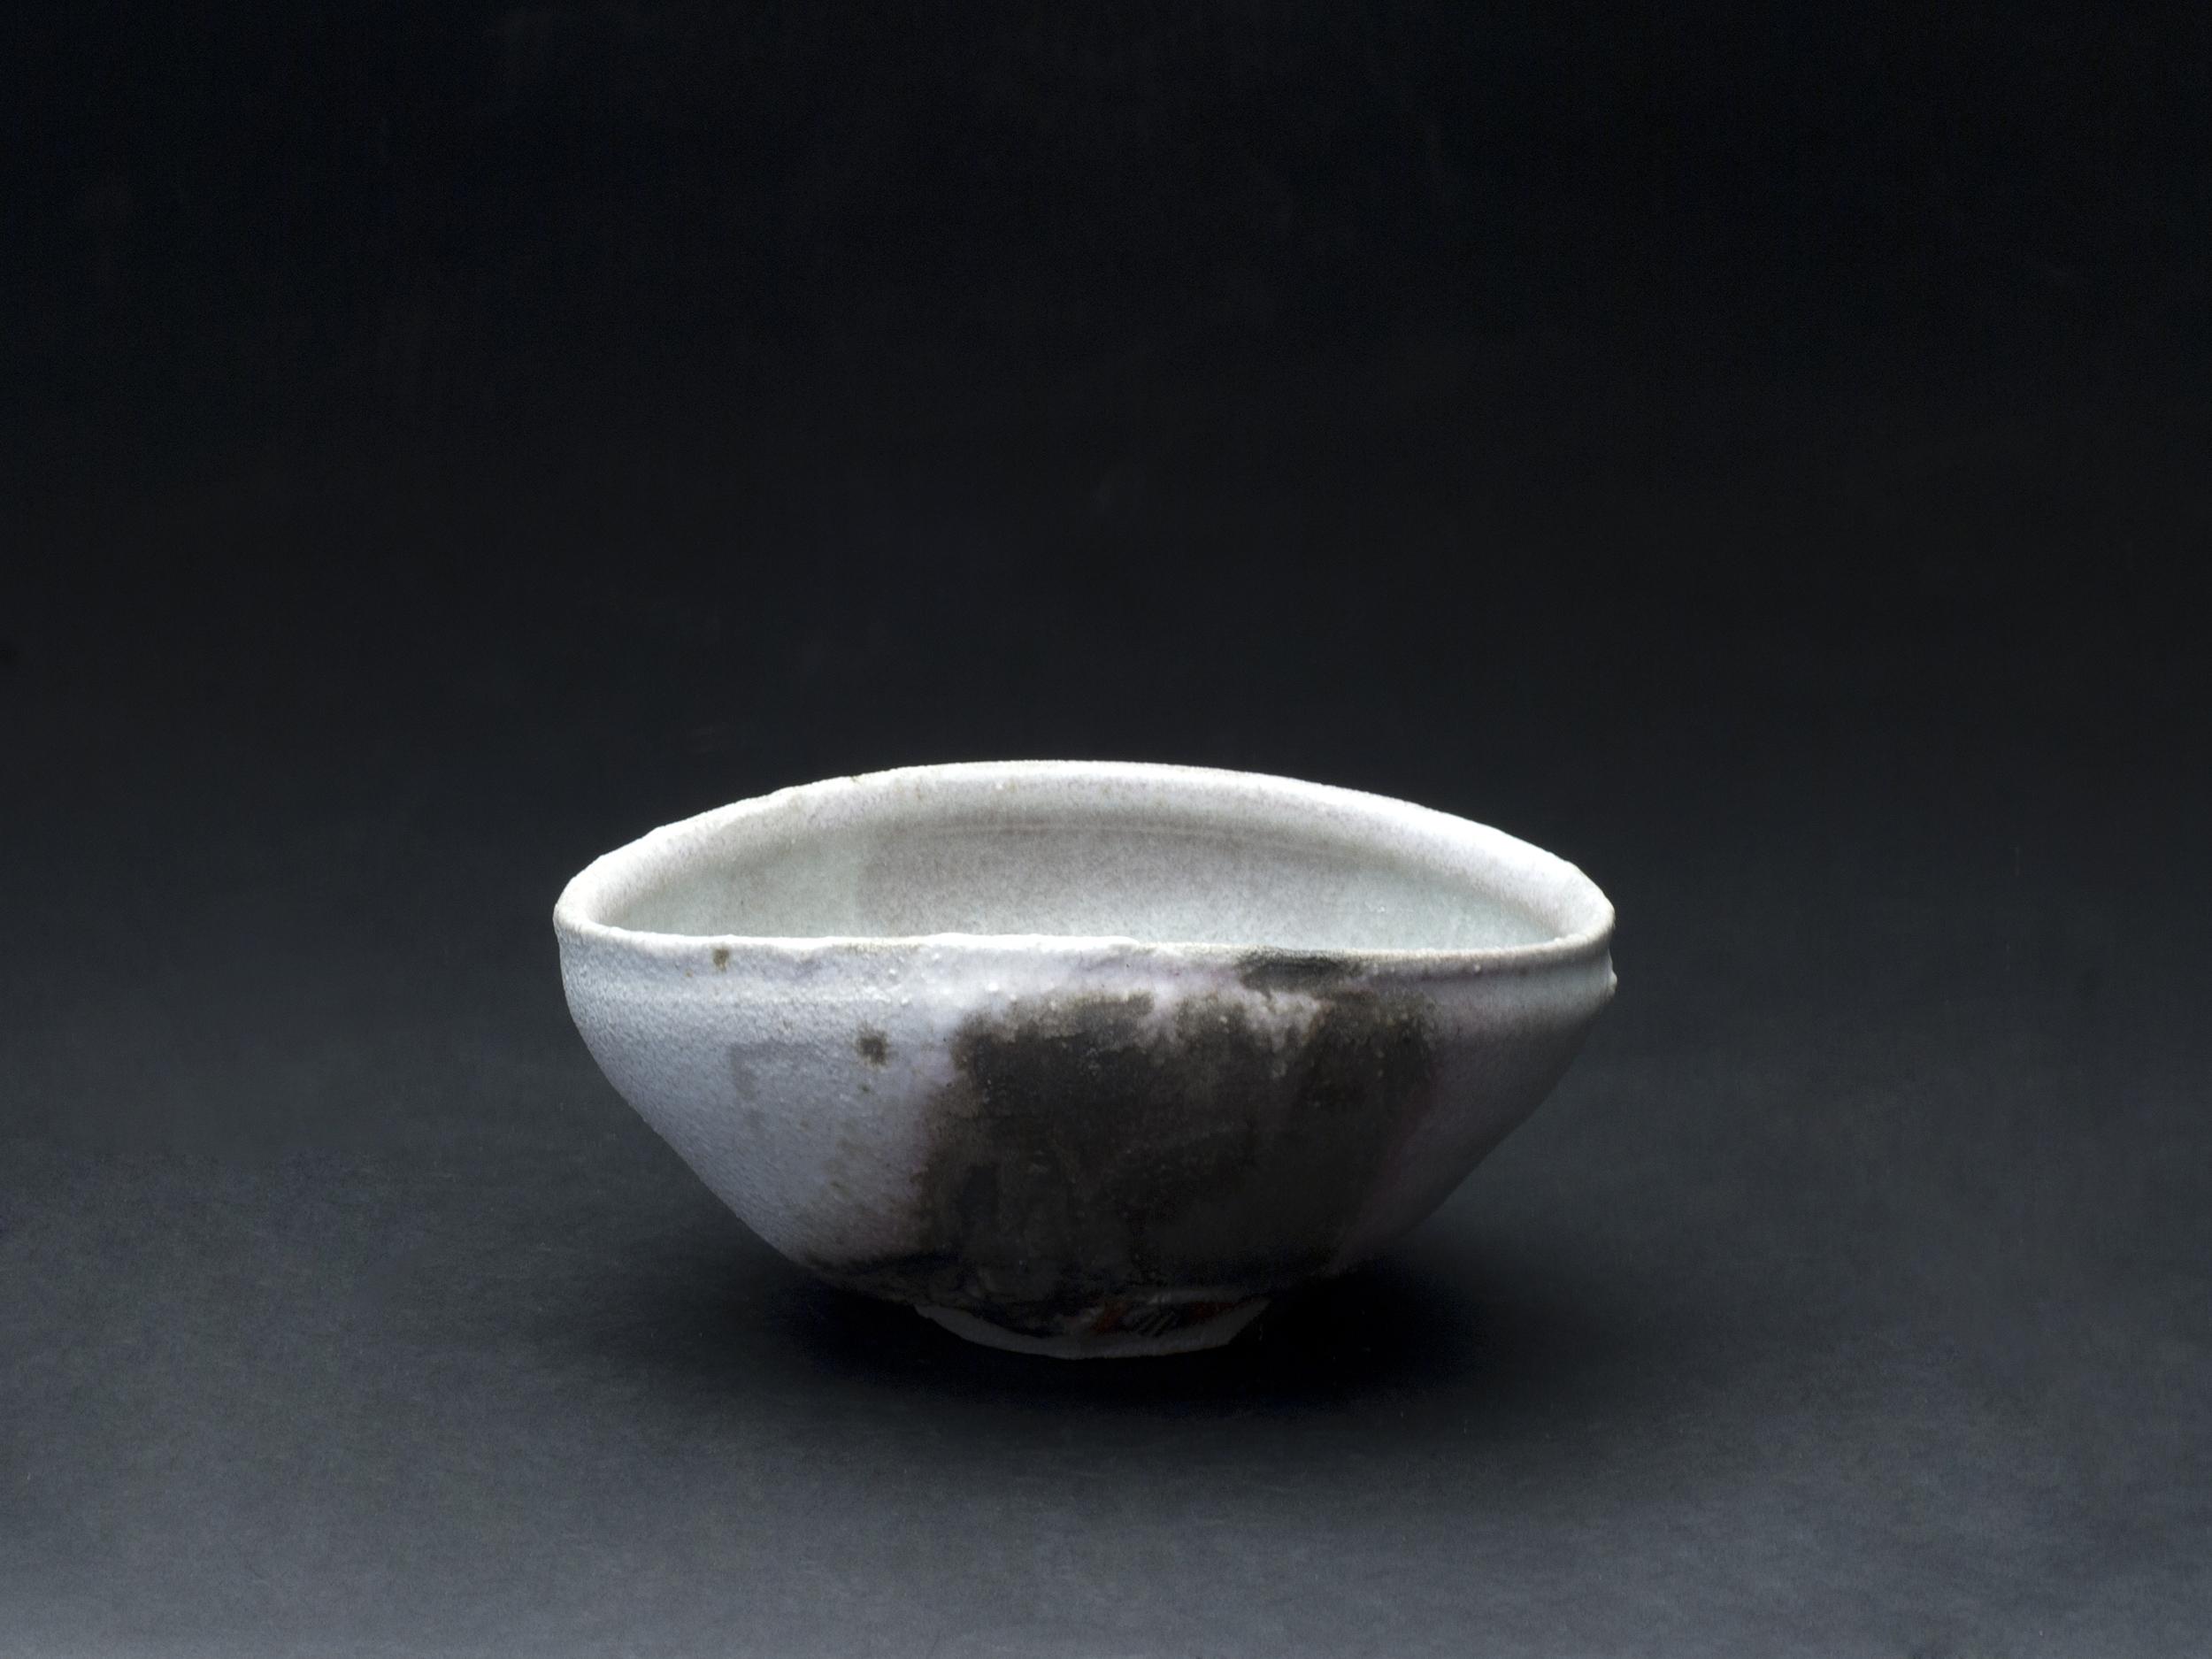 Jeff Shapiro    Chawan  , 2012 Ceramic 2.75 x 6.5 x 5.625 inches  7 x 16.5 x 14.3 cm  JSh 47